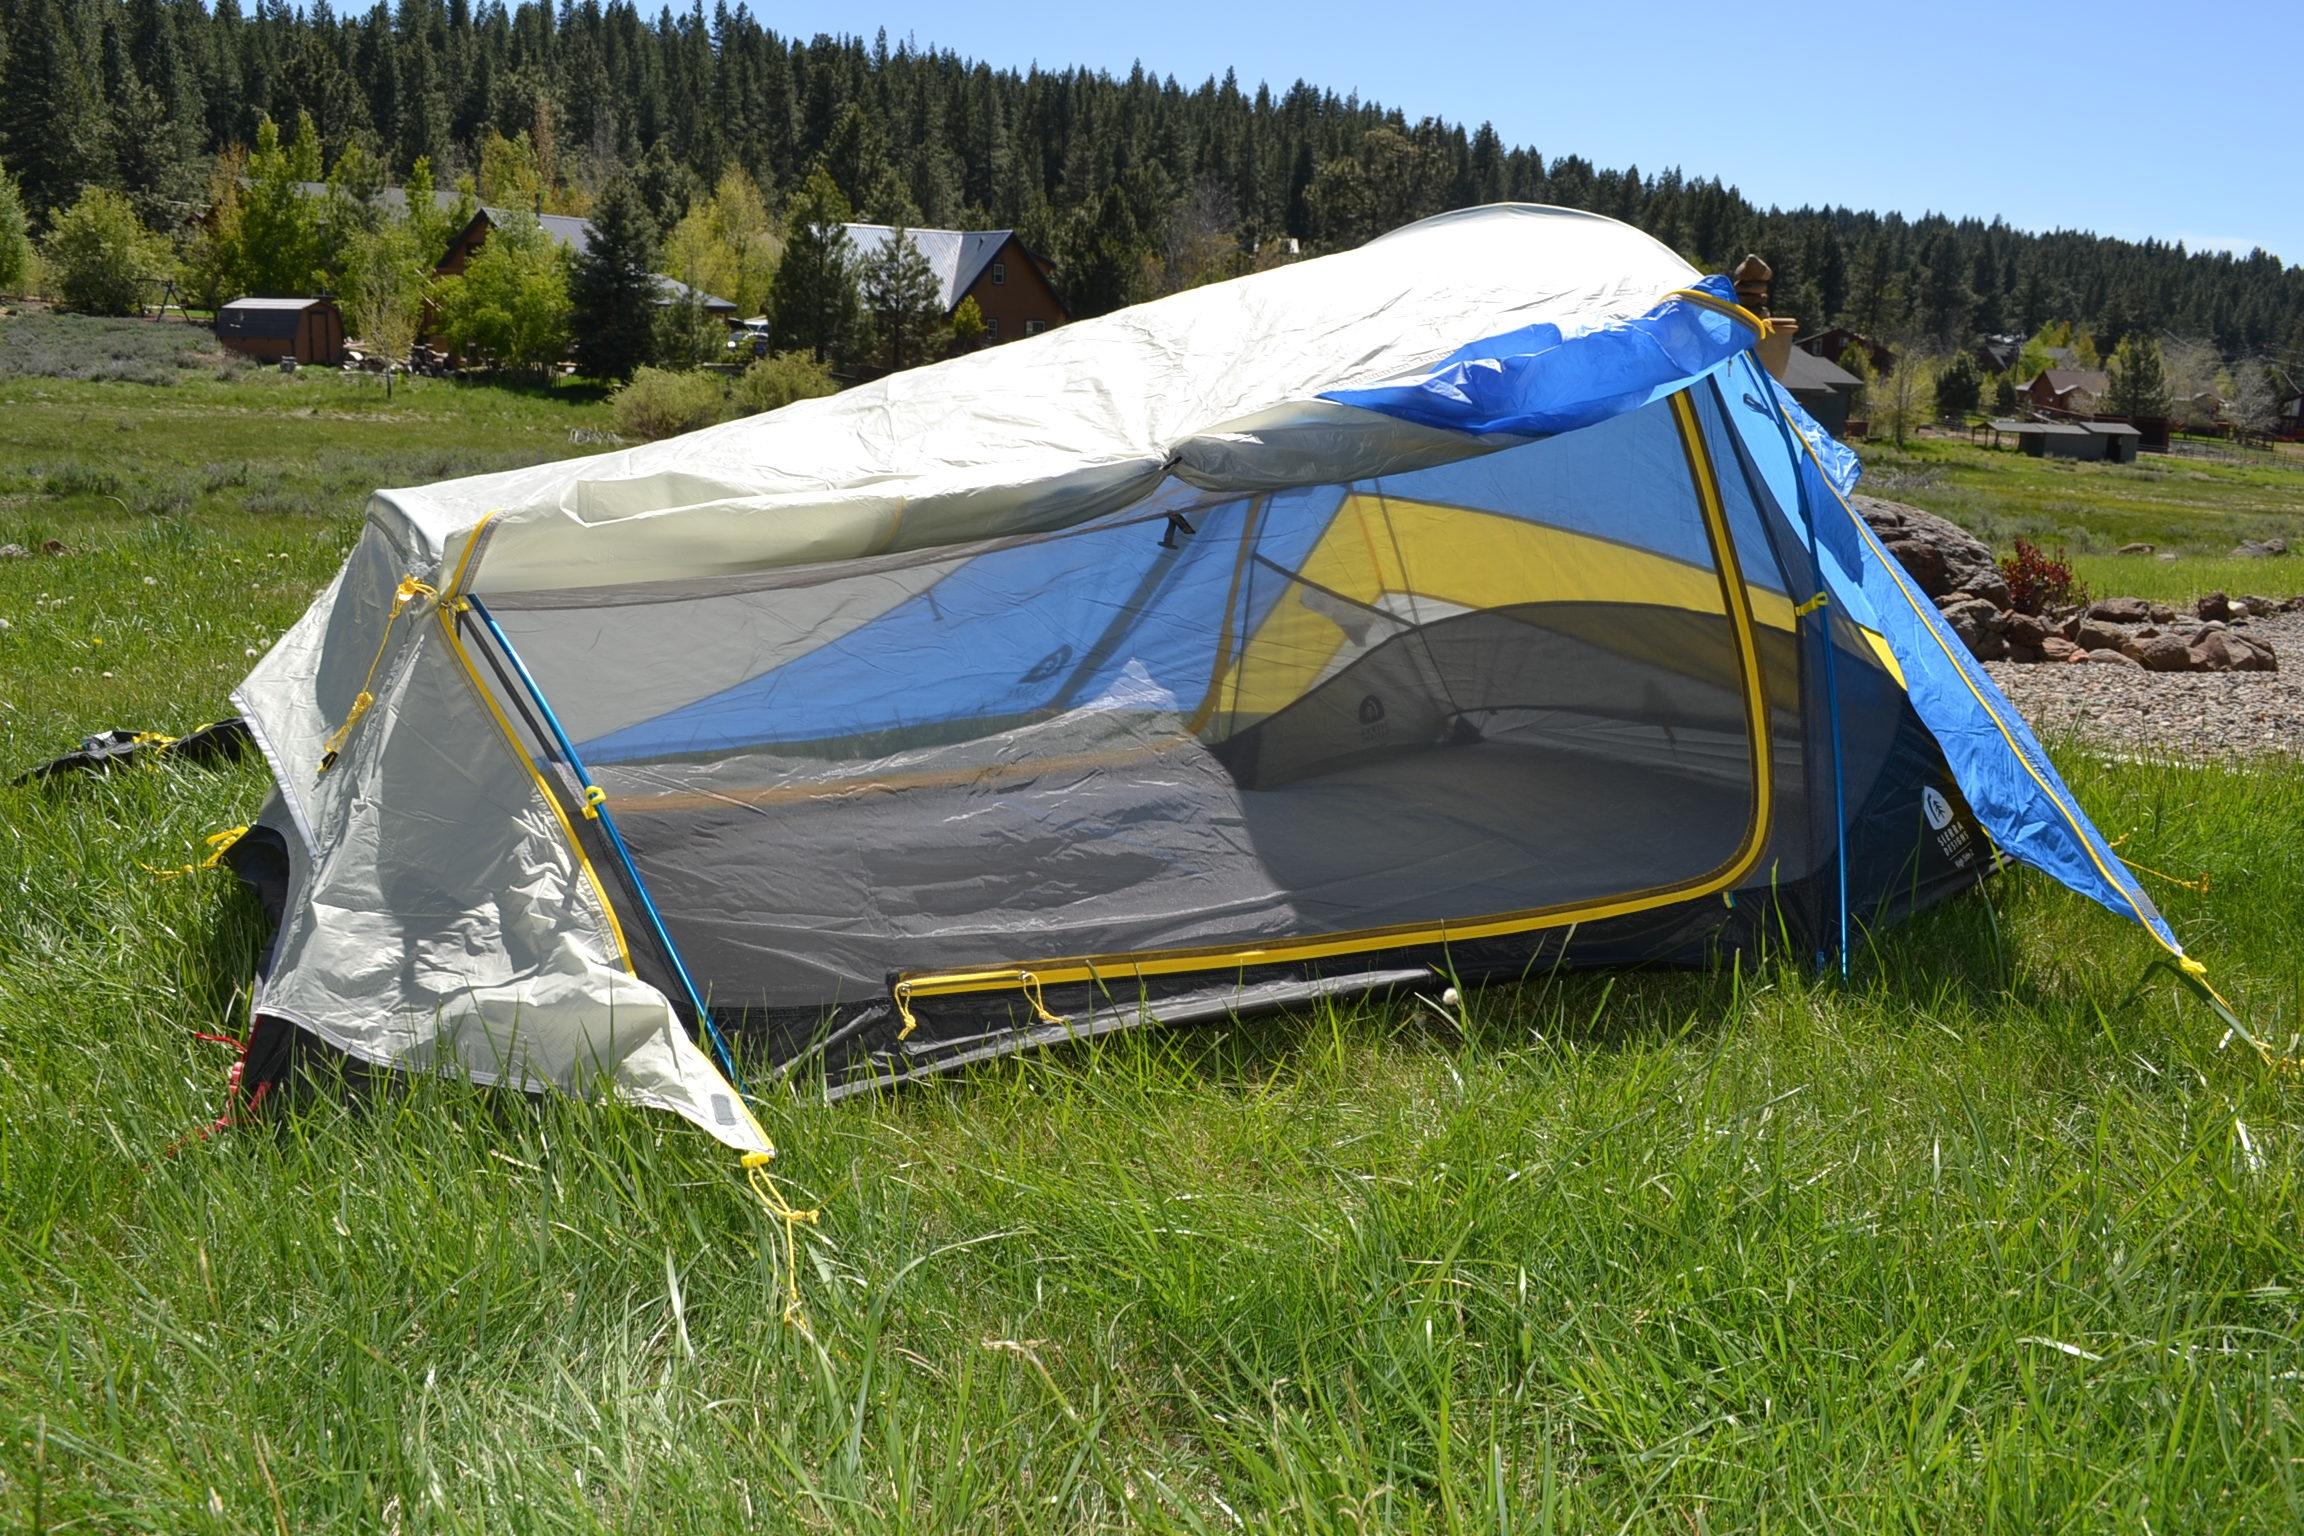 Sierra Designs High Side 2 Tent Review - The Trek